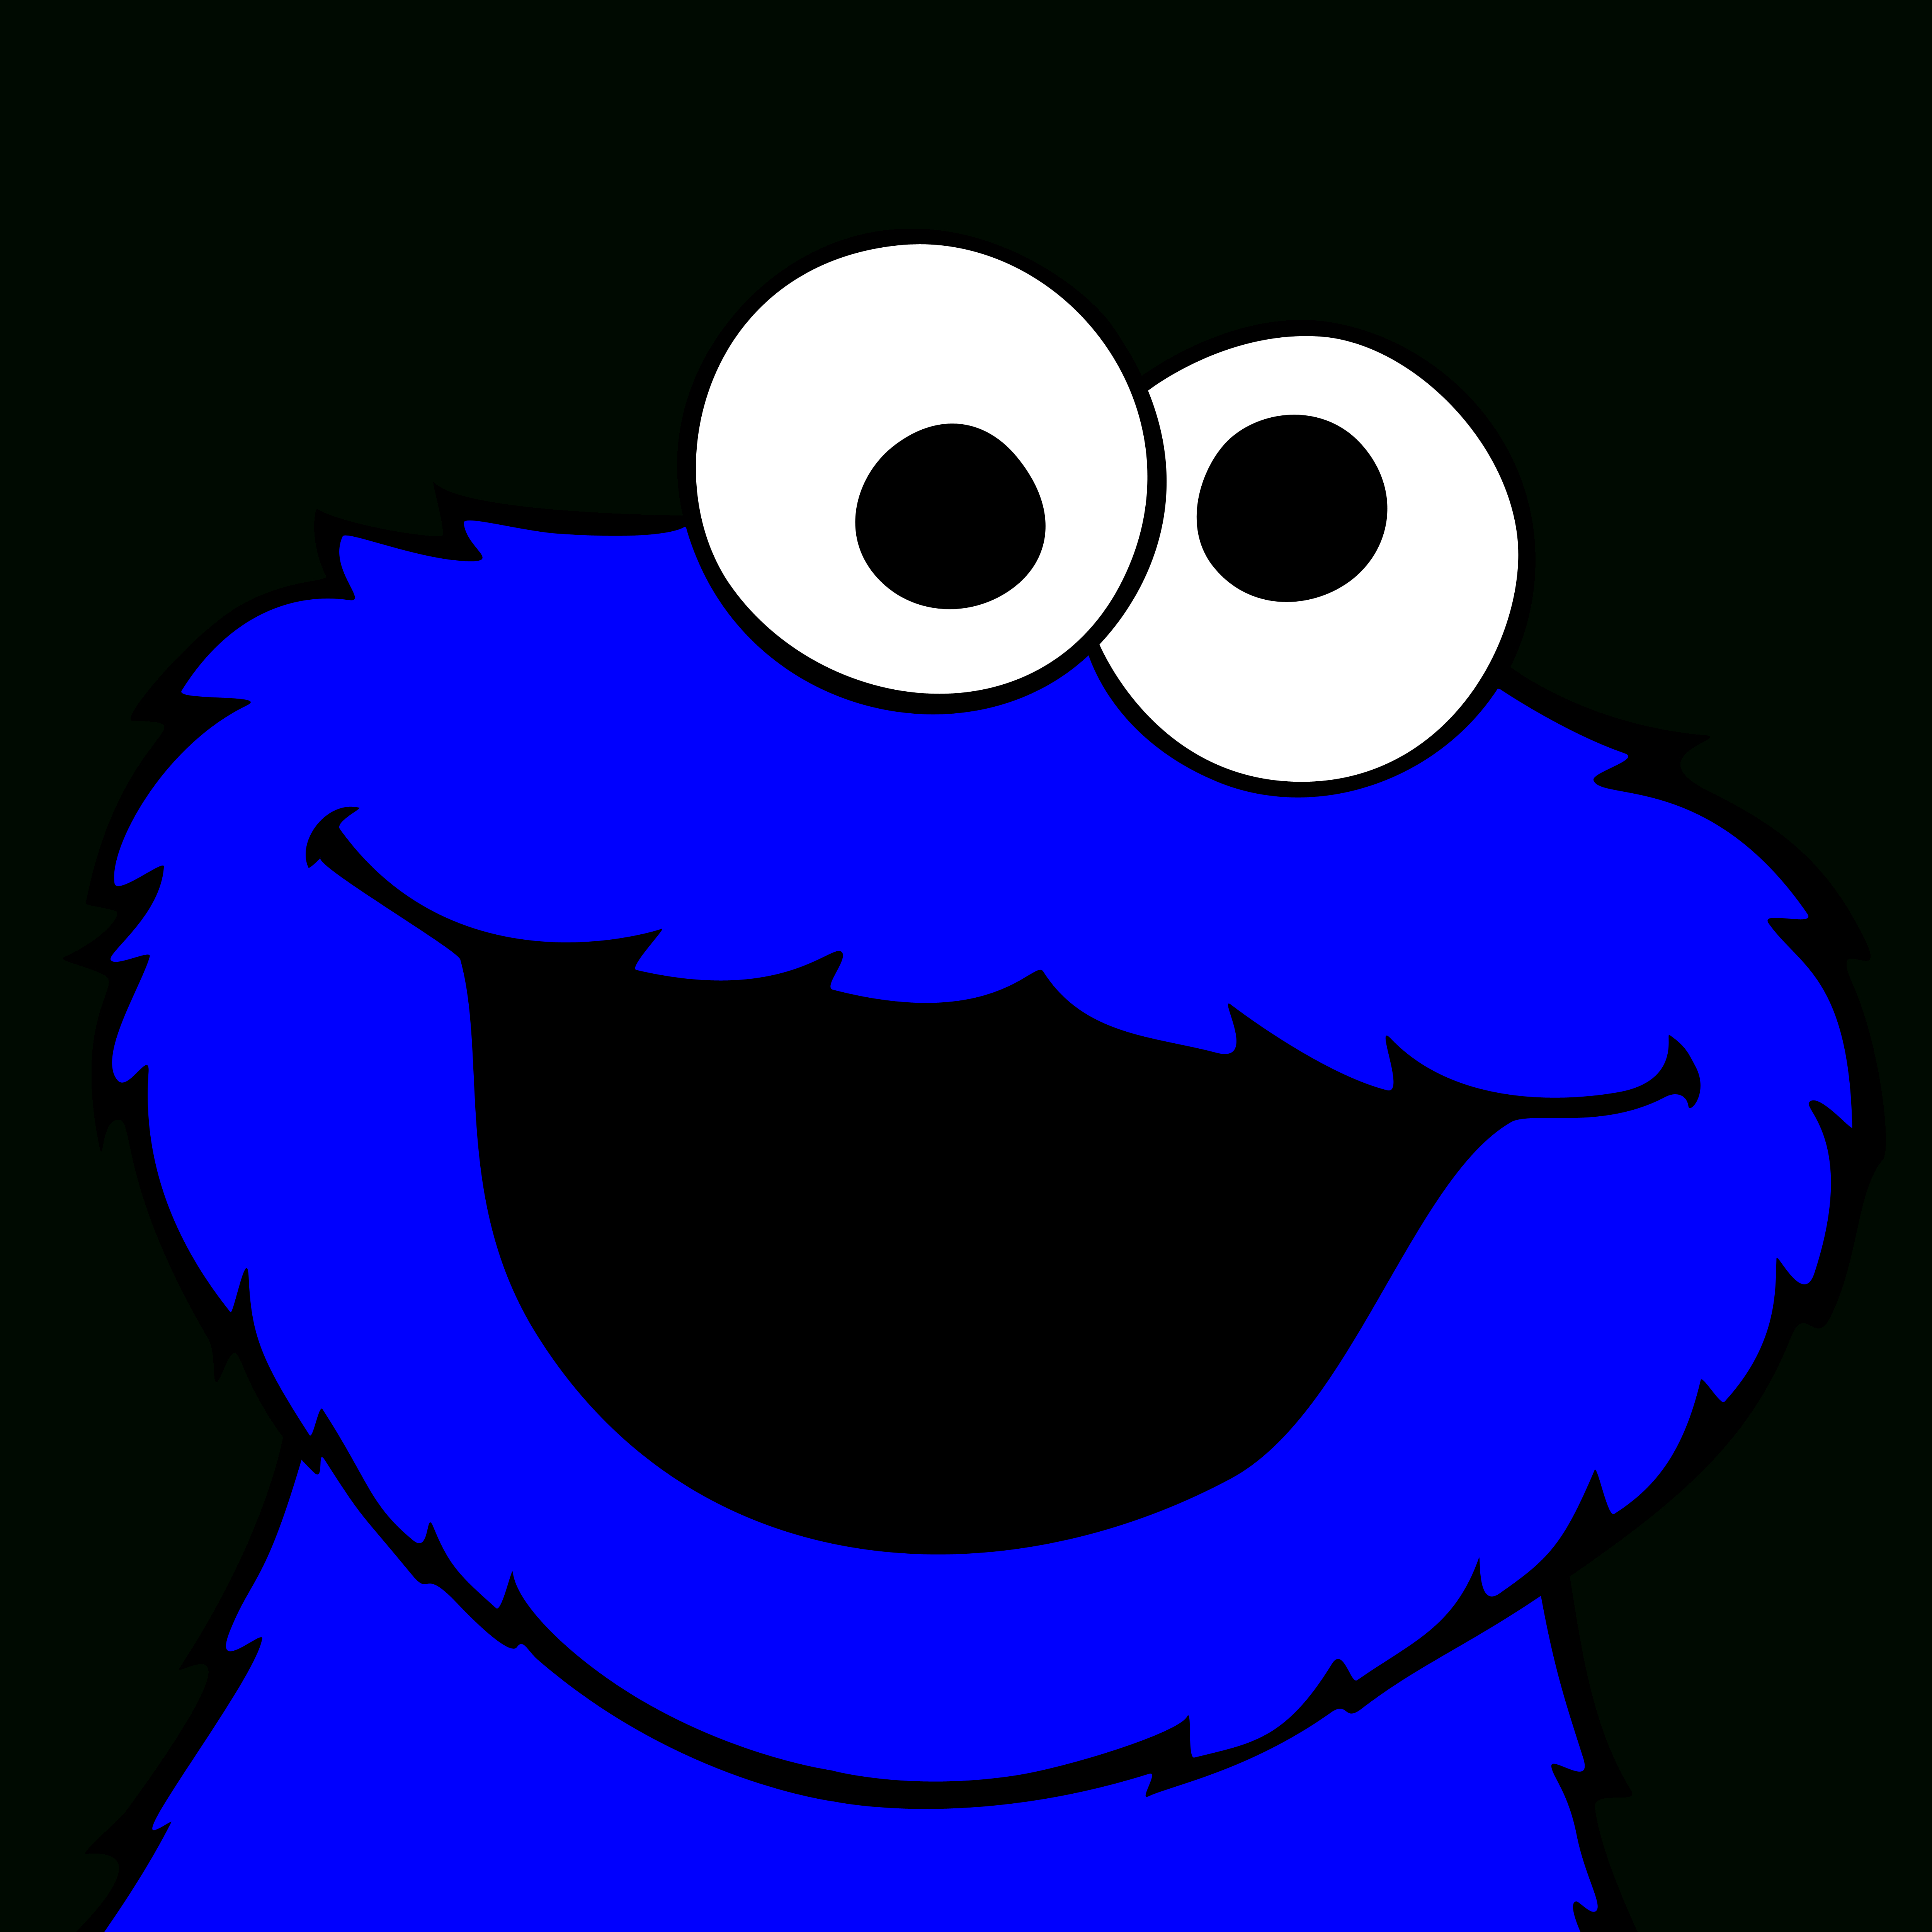 Cookie Monster Printables | Free Download Best Cookie Monster - Free Printable Cookie Monster Face